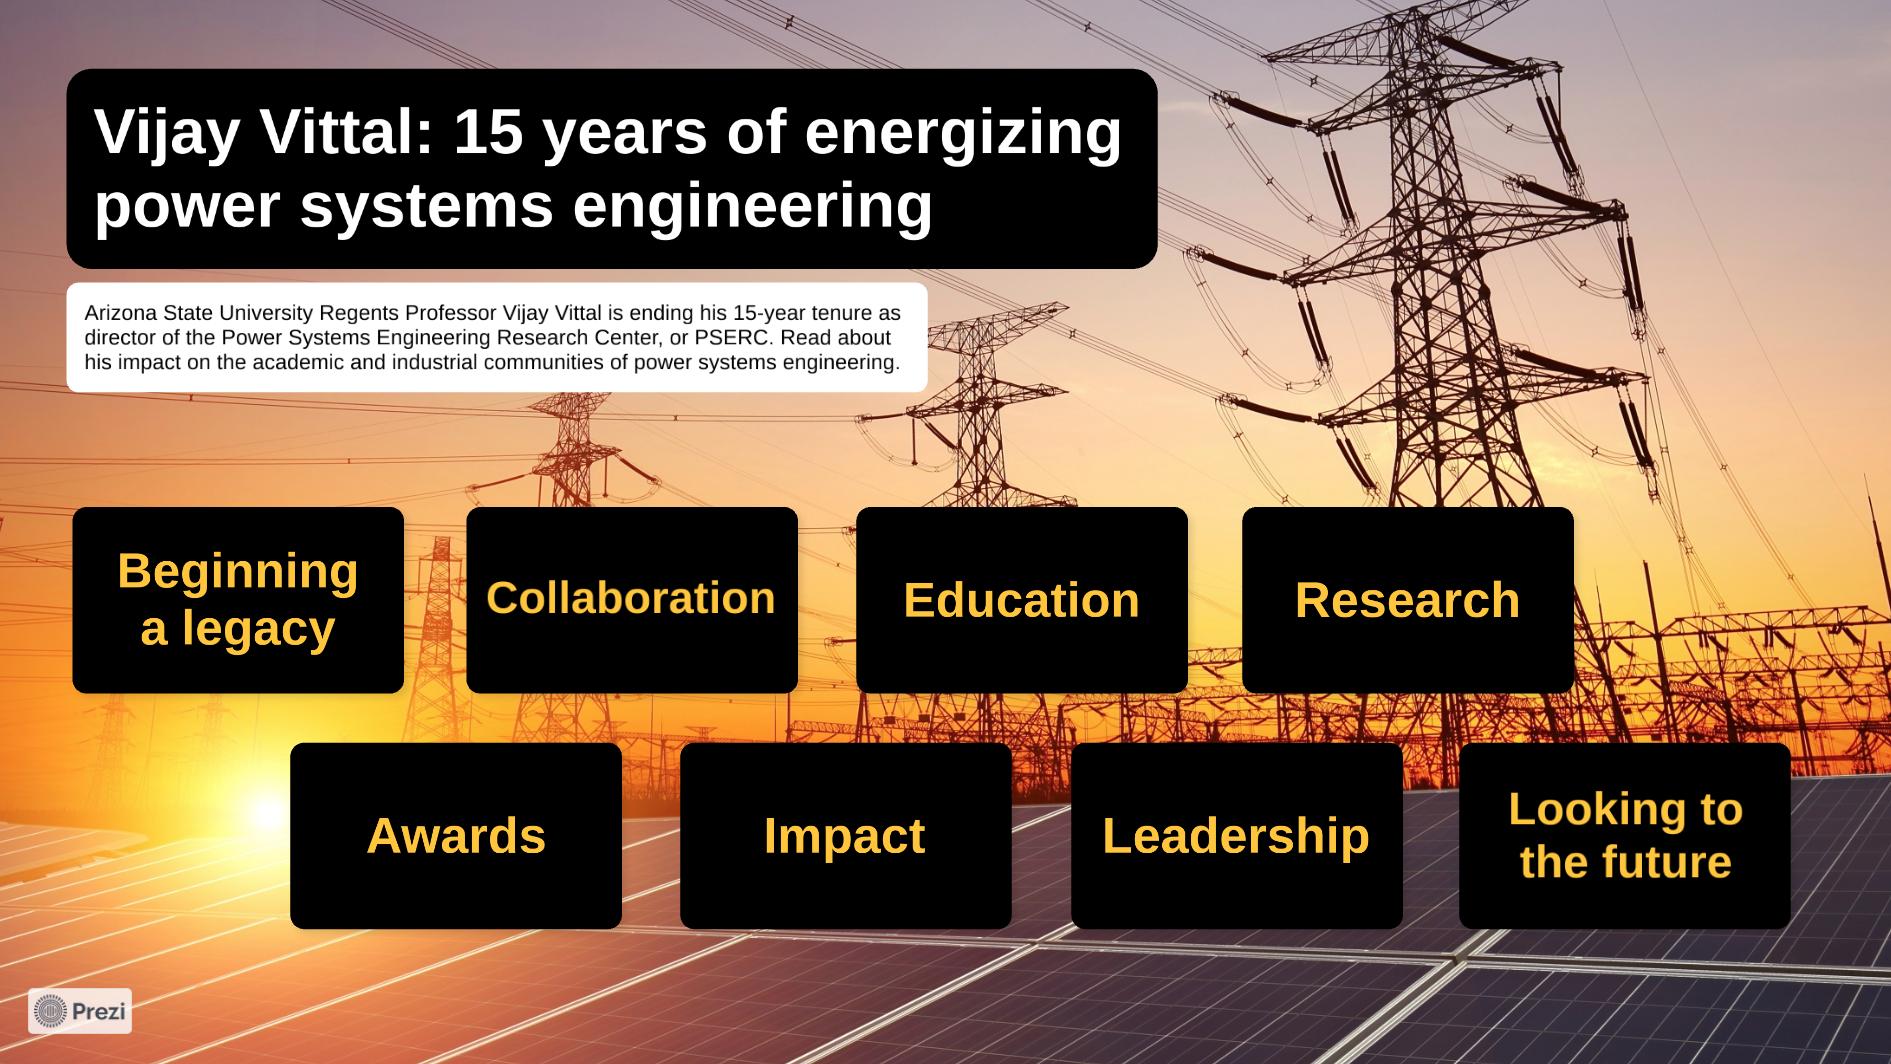 """Vijay Vittal: 15 years of energizing power systems engineering"" Prezi home screen."